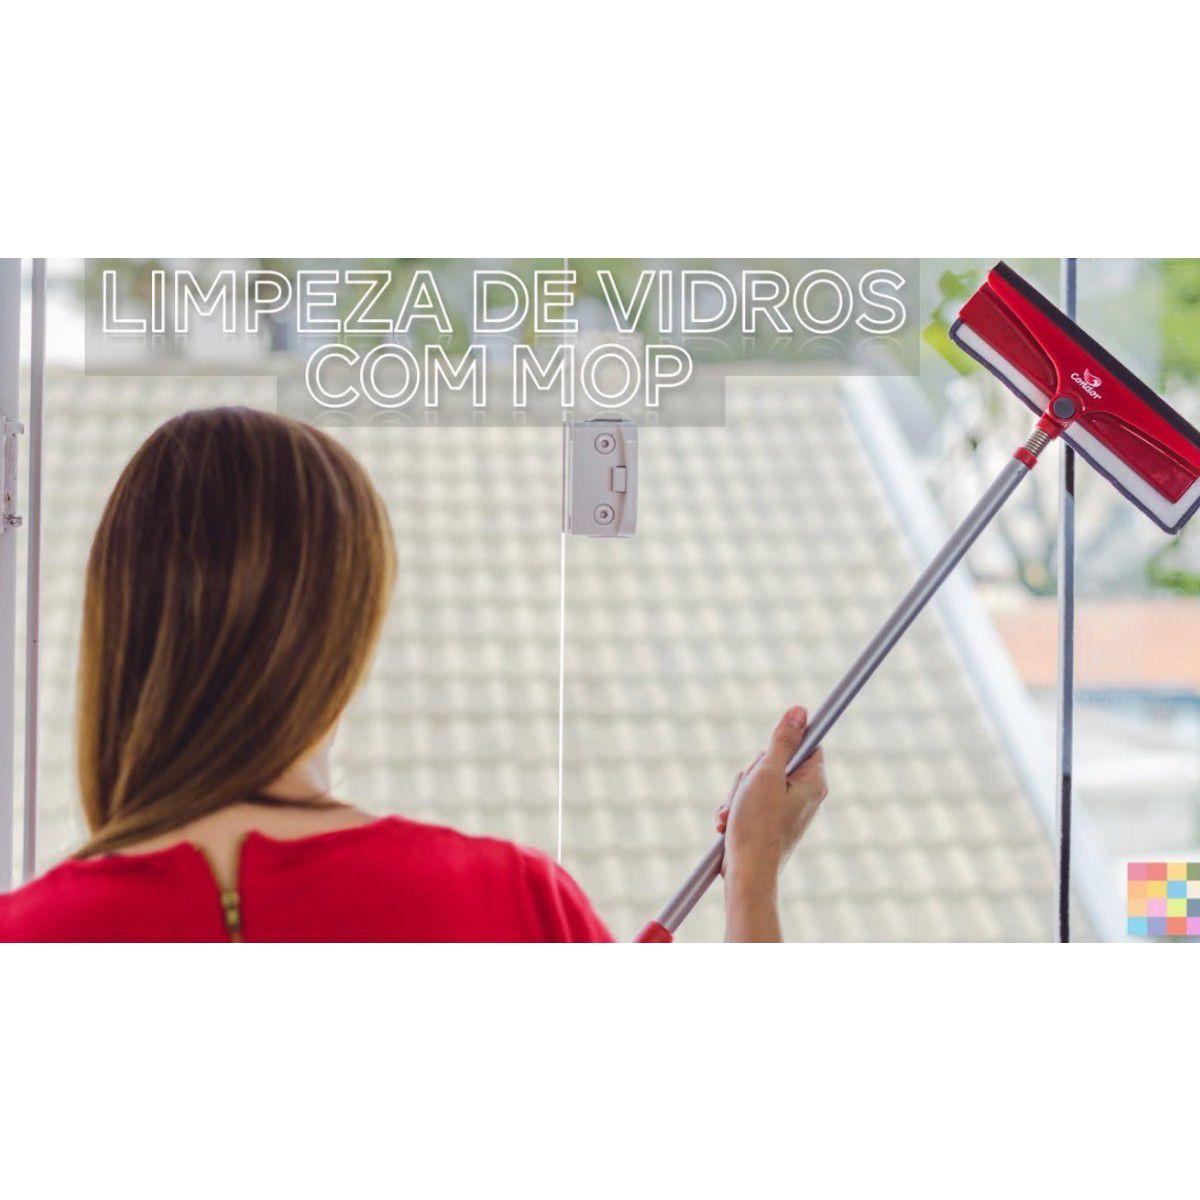 Refil Avulso Microfibra Para Rodo Limpa Vidros Condor